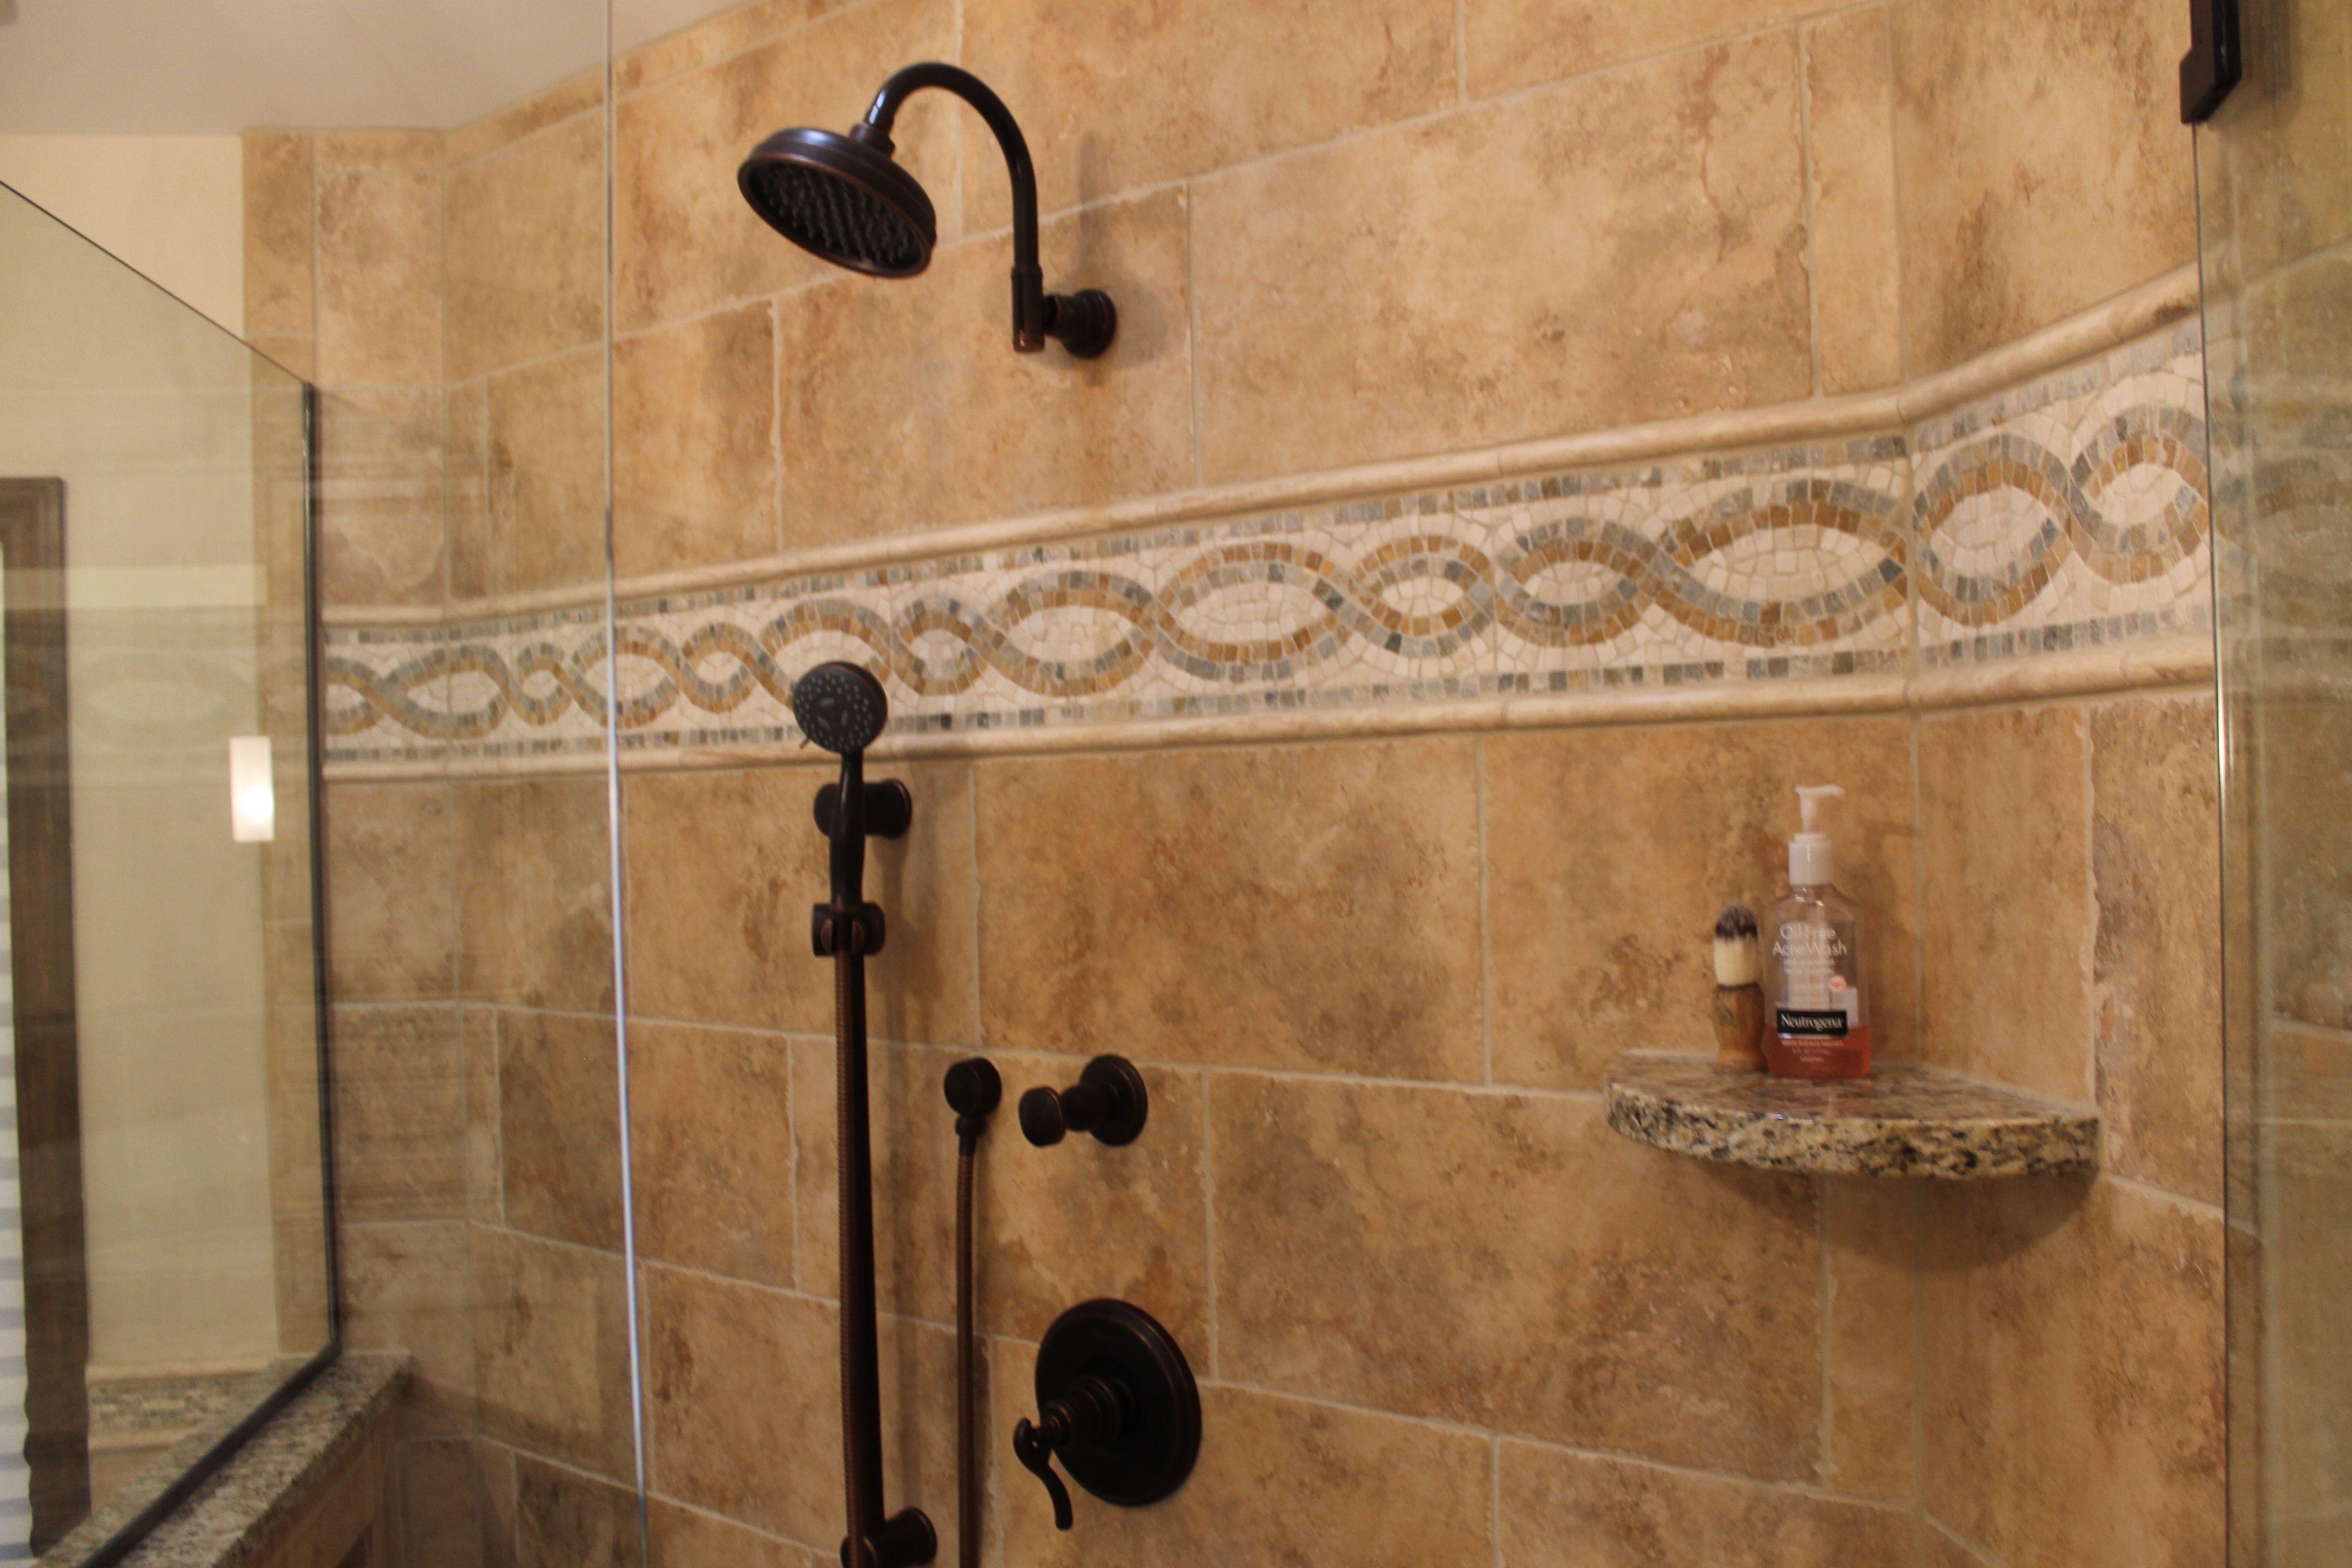 Roman Bronze Fixtures in Custom Tiled shower with Tile Accent ...